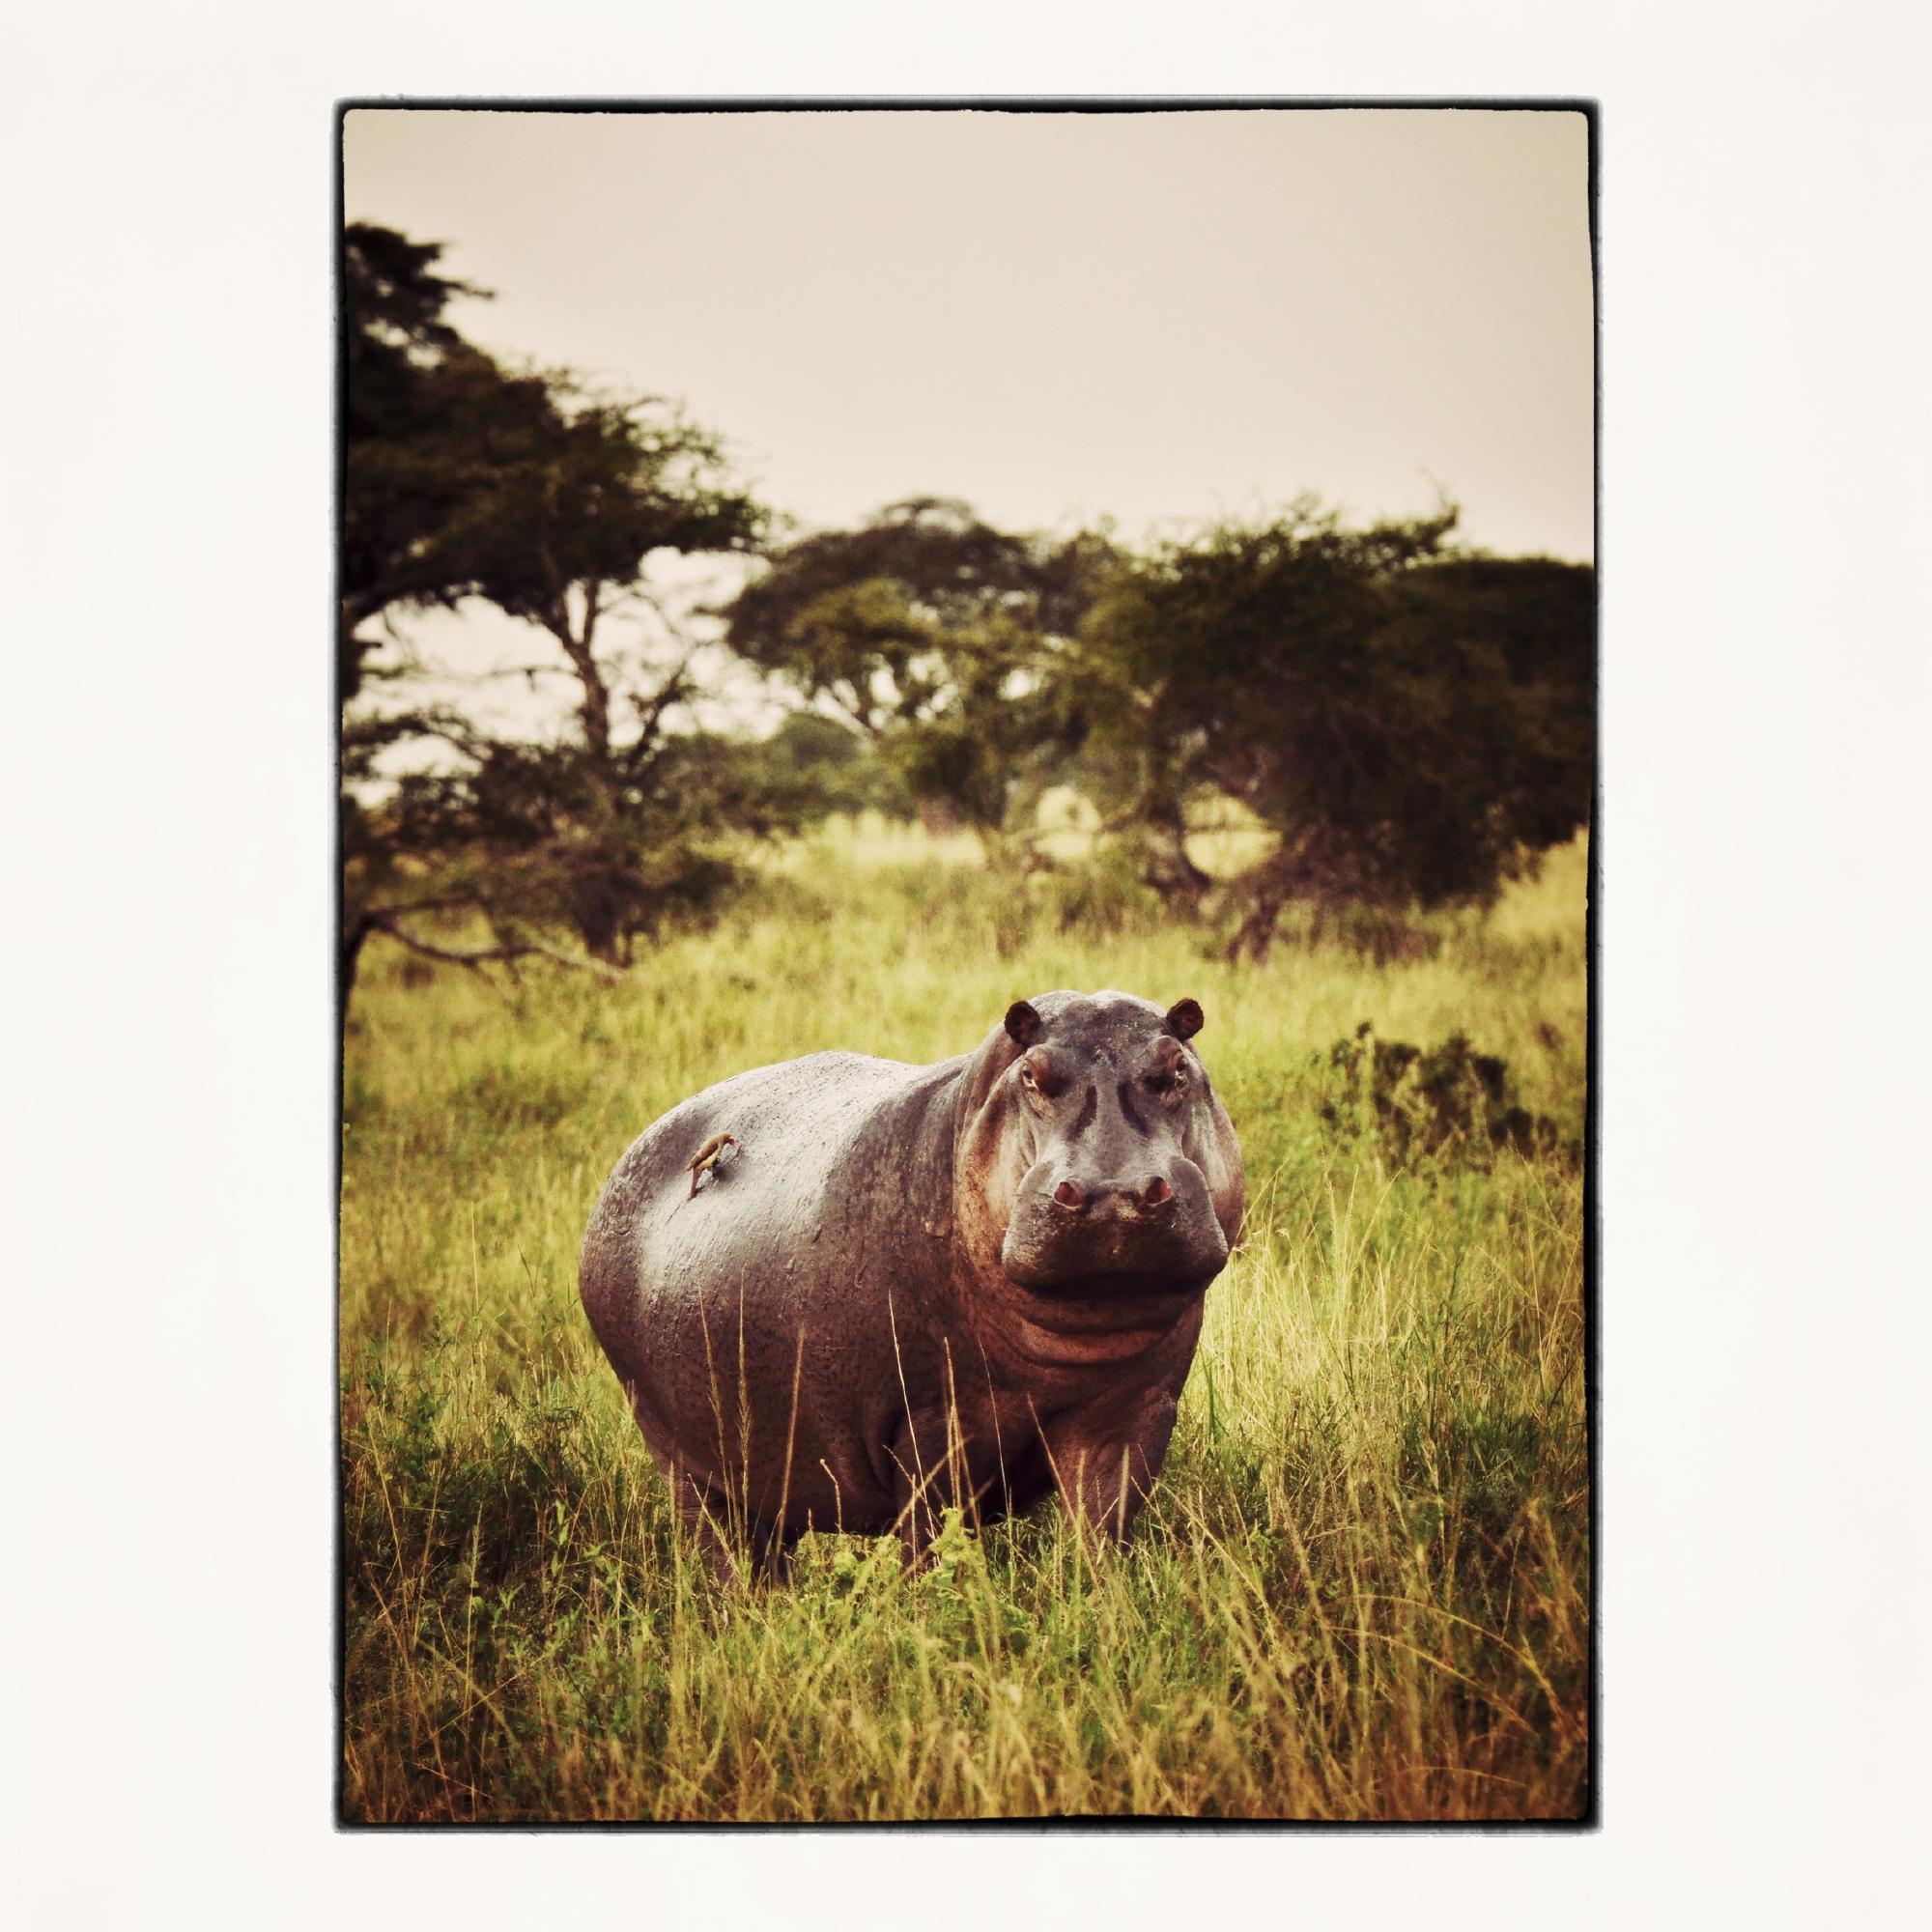 20x20 hippo